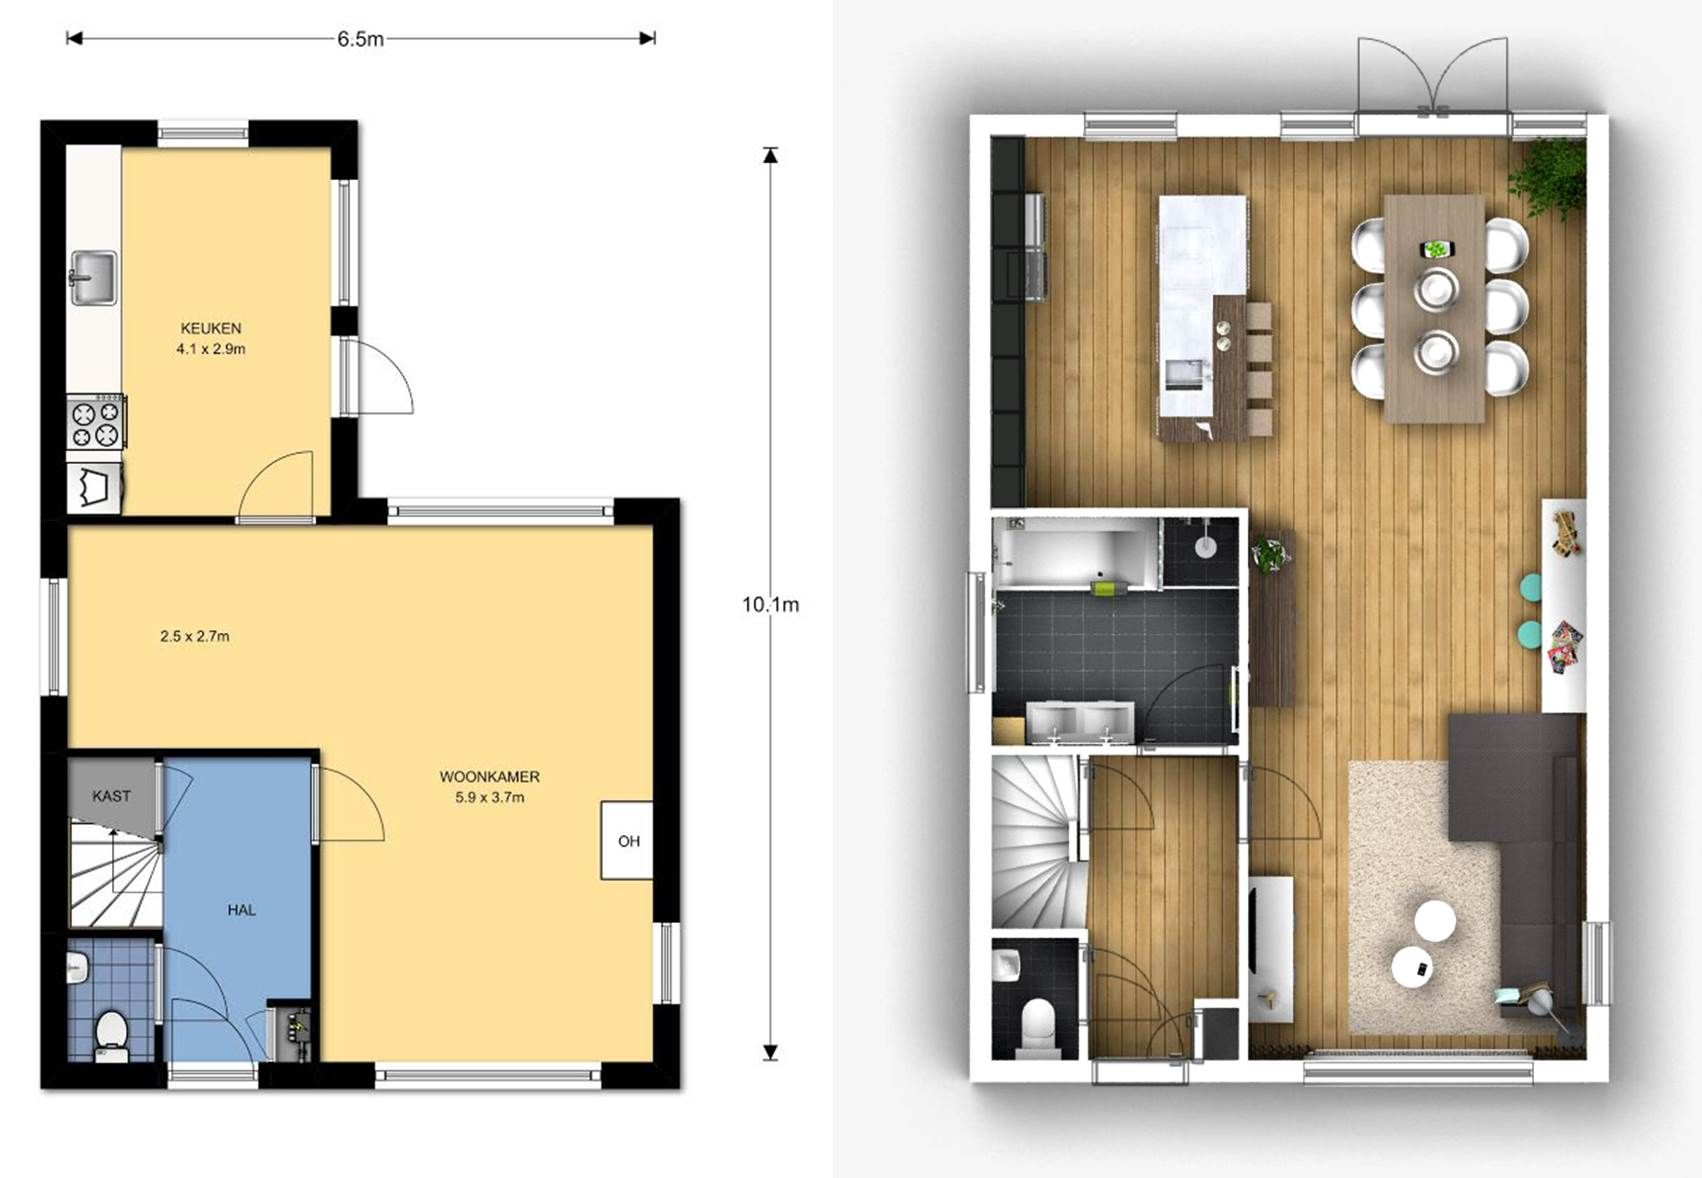 plattegrond interieuradvies woonkamer keuken badkamer woonathome, Deco ideeën